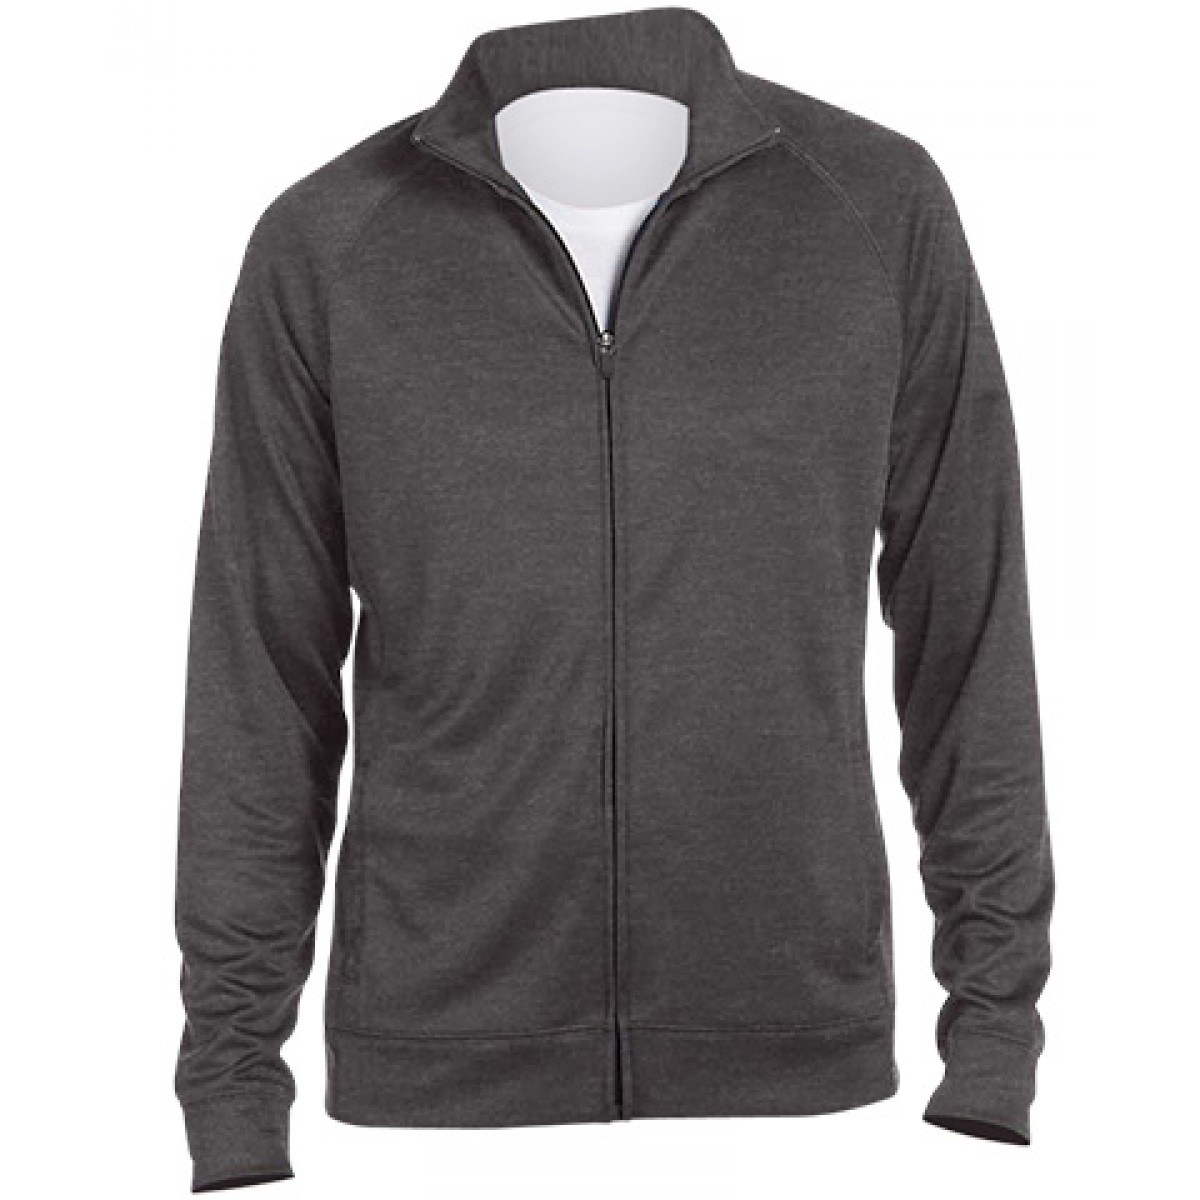 Men's Lightweight Sports Jacket-Sports Grey-XS